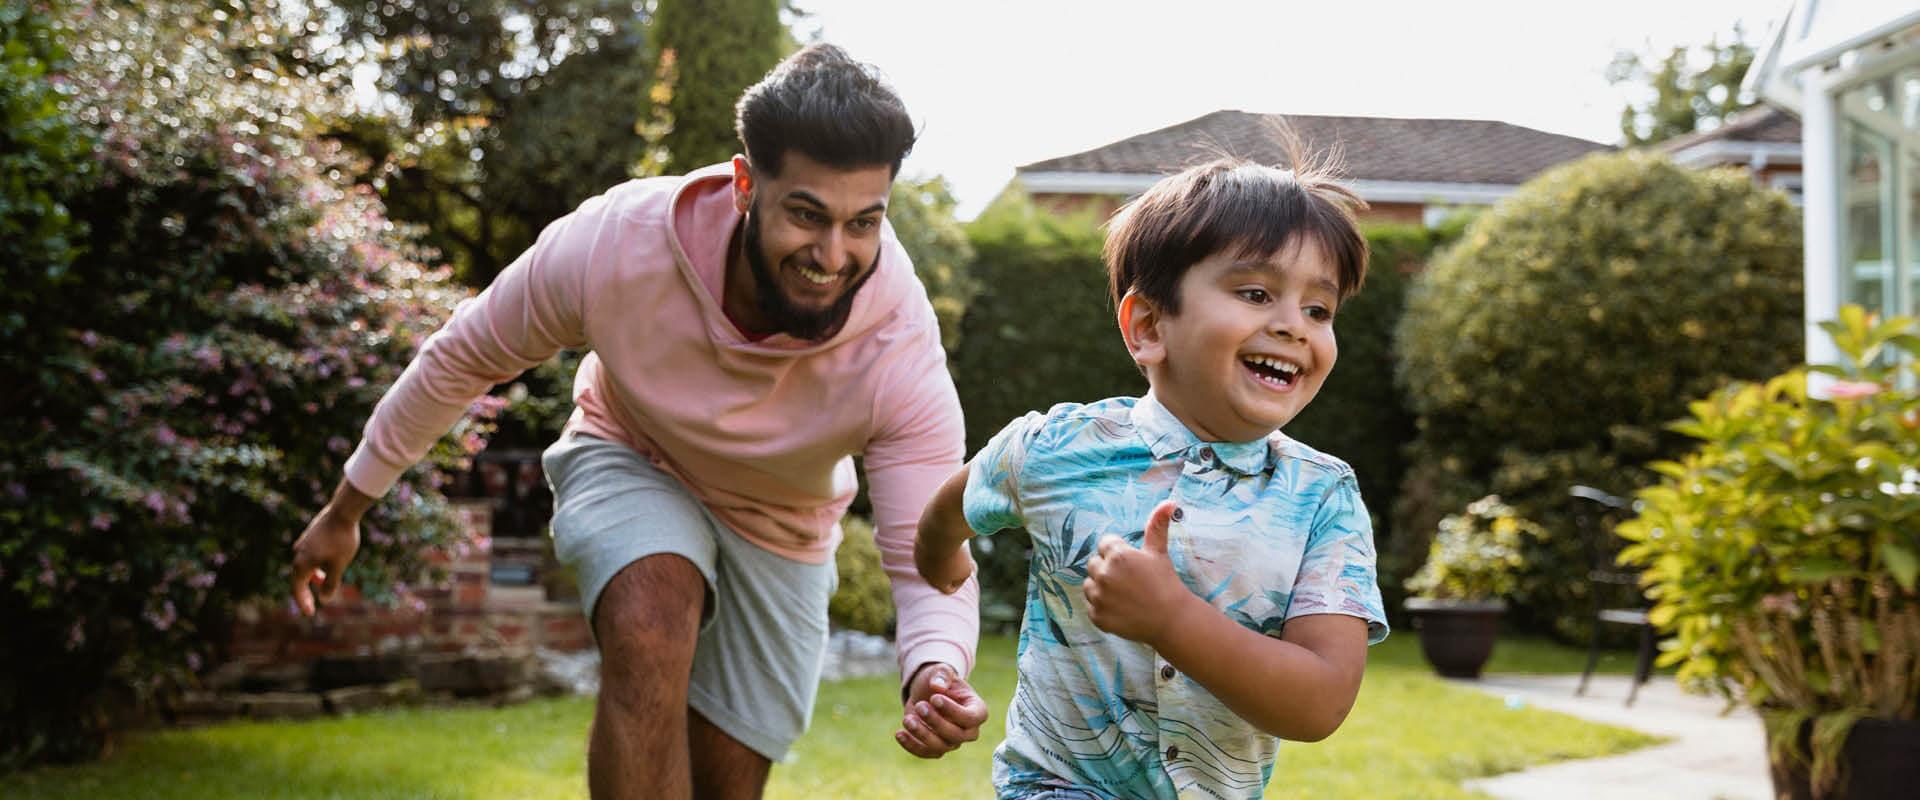 Father running after child in garden